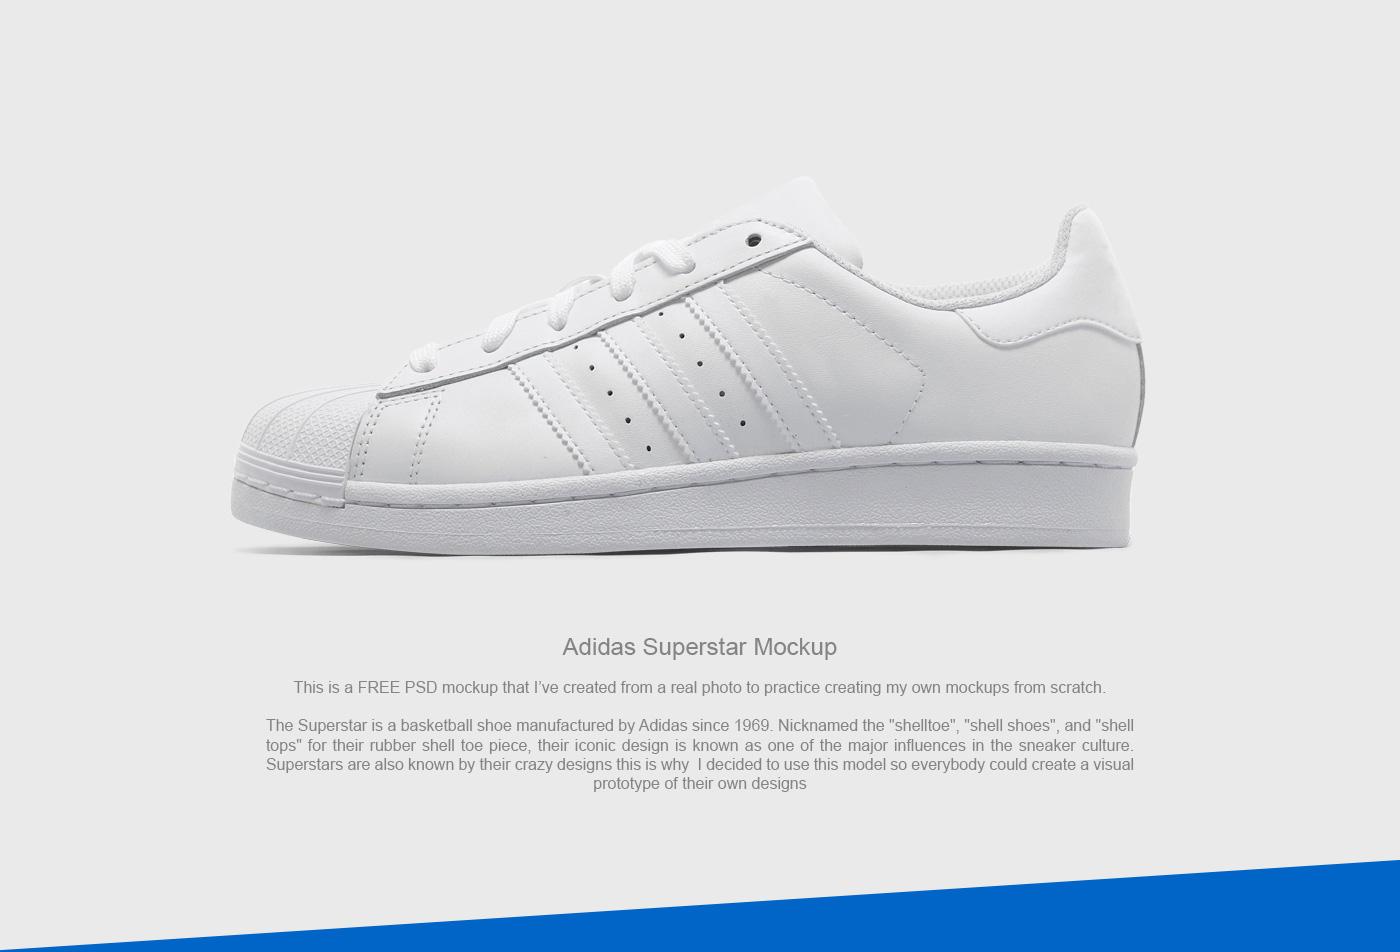 free-psd-mockup-adidas-superstar